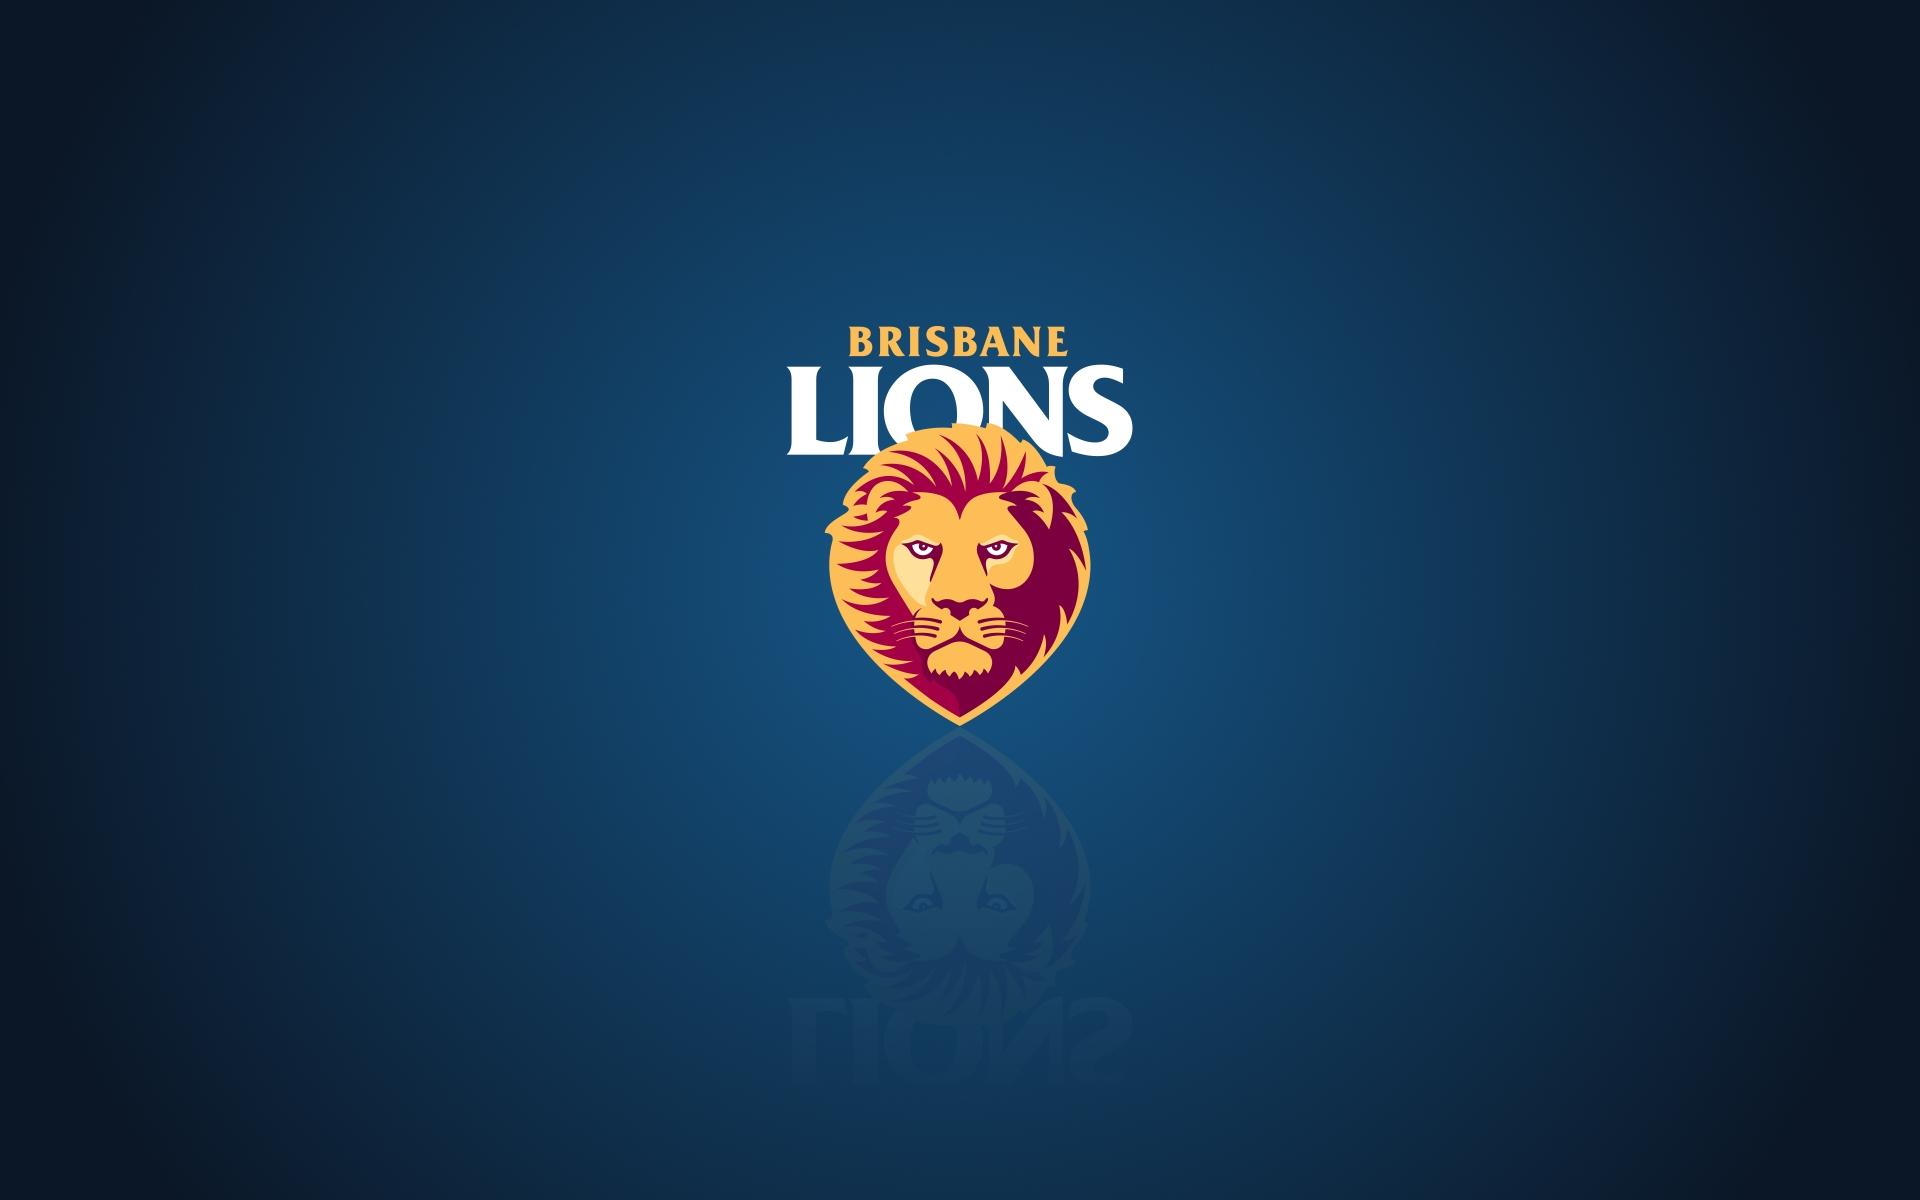 brisbane lions - photo #19